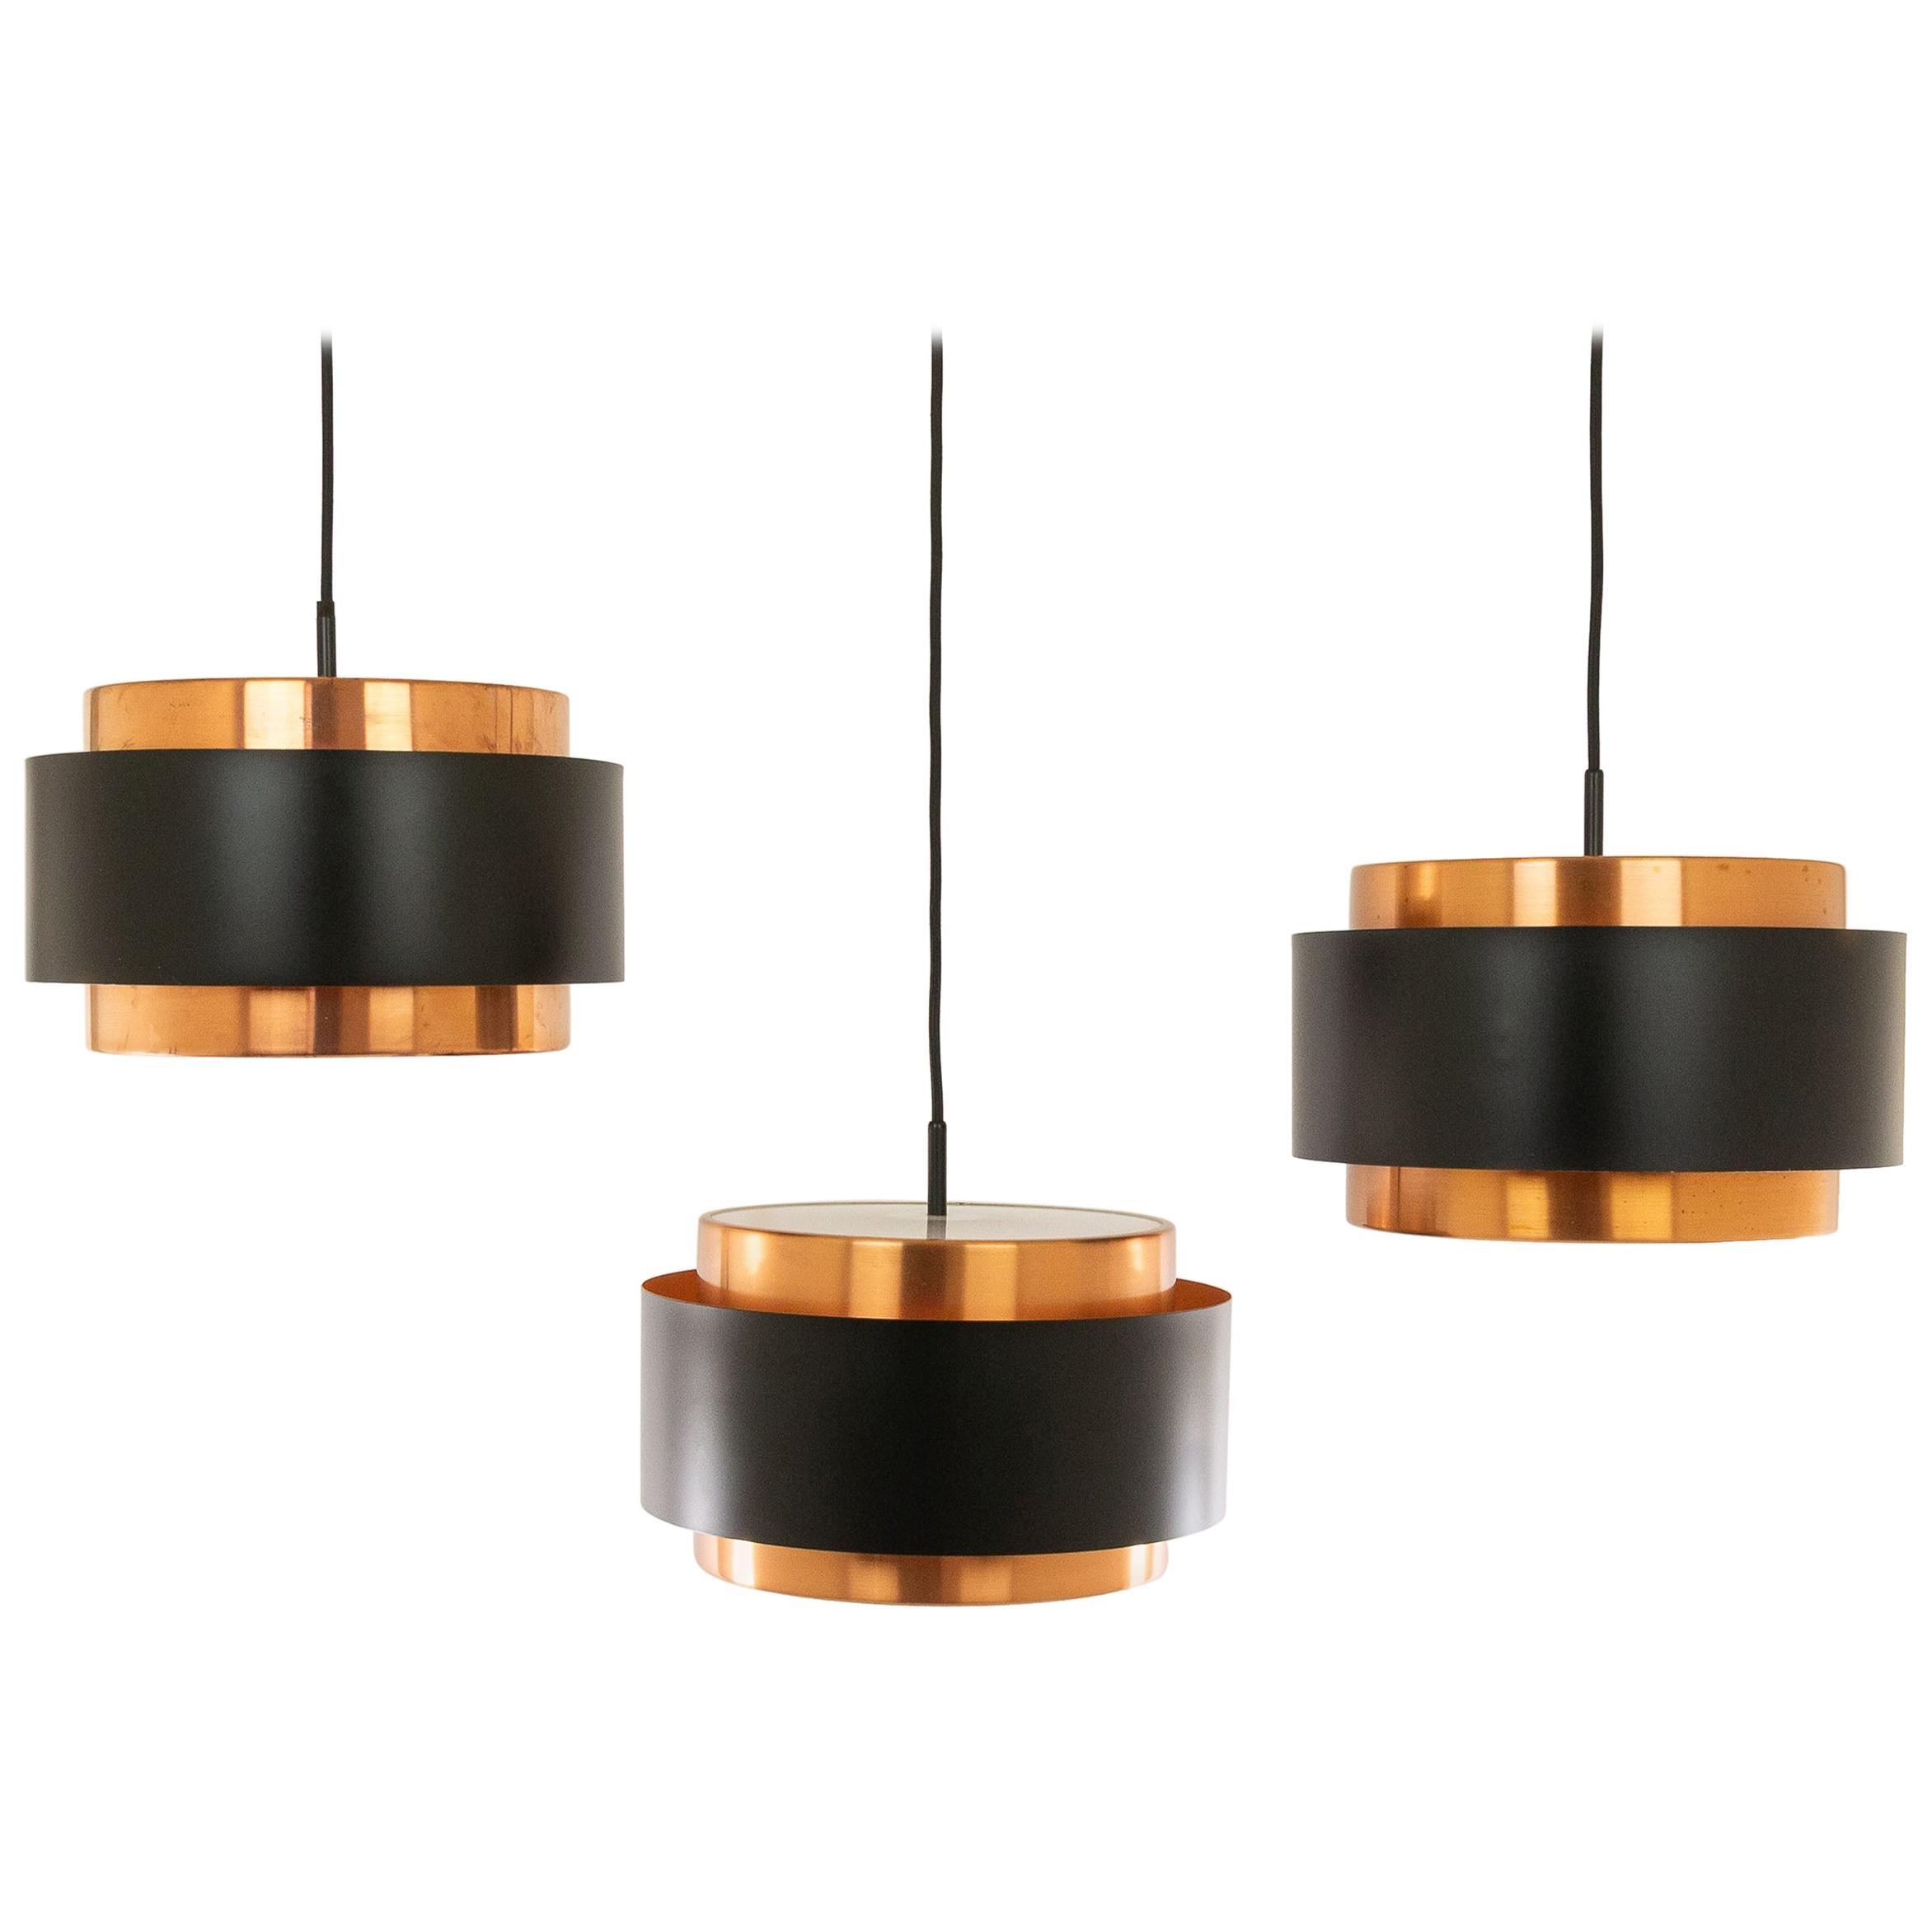 Set of Three Copper 'Saturn' Pendants by Jo Hammerborg for Fog & Mørup, 1960s